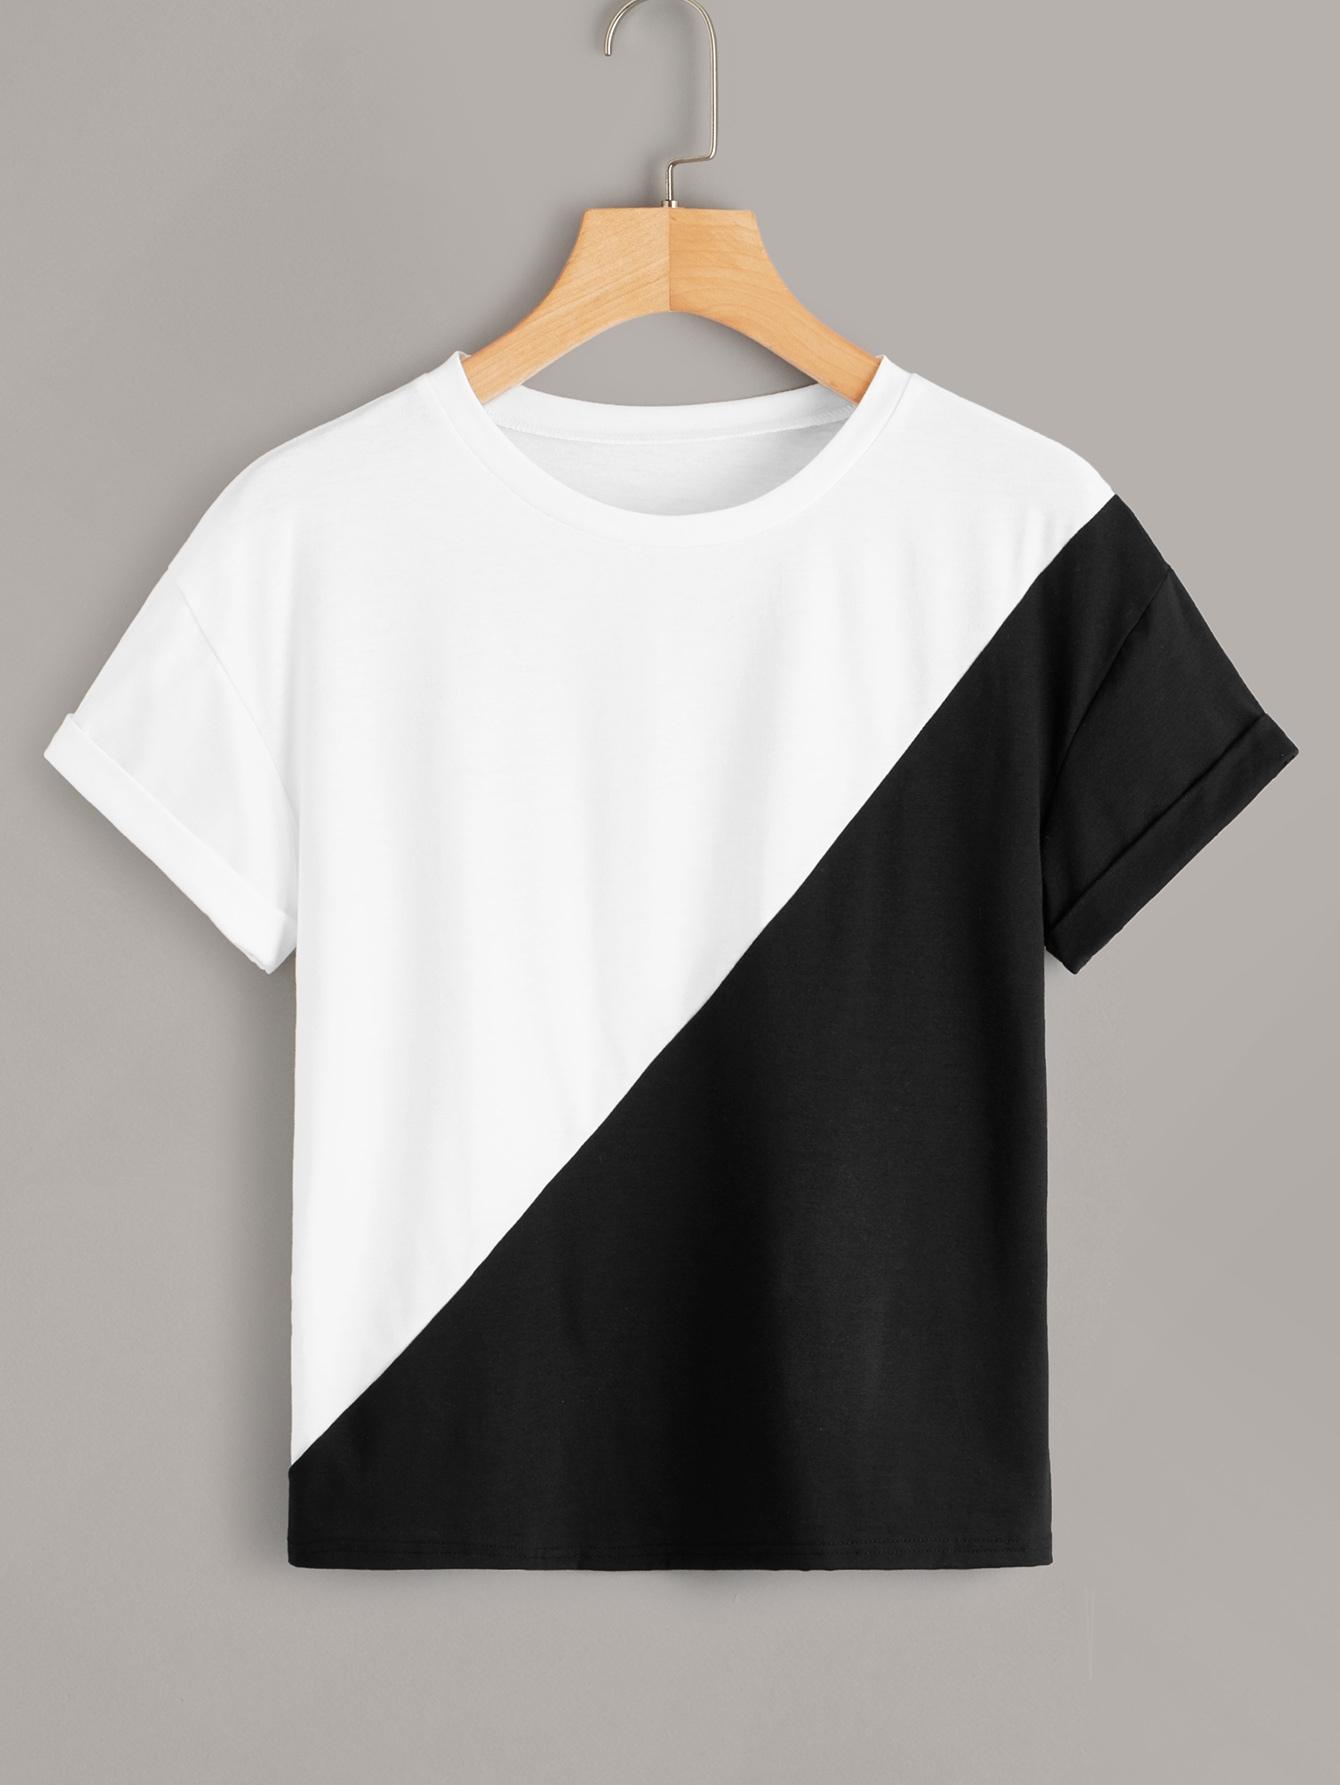 Фото - Двухцветная футболка от SheIn цвет чёрнобелые